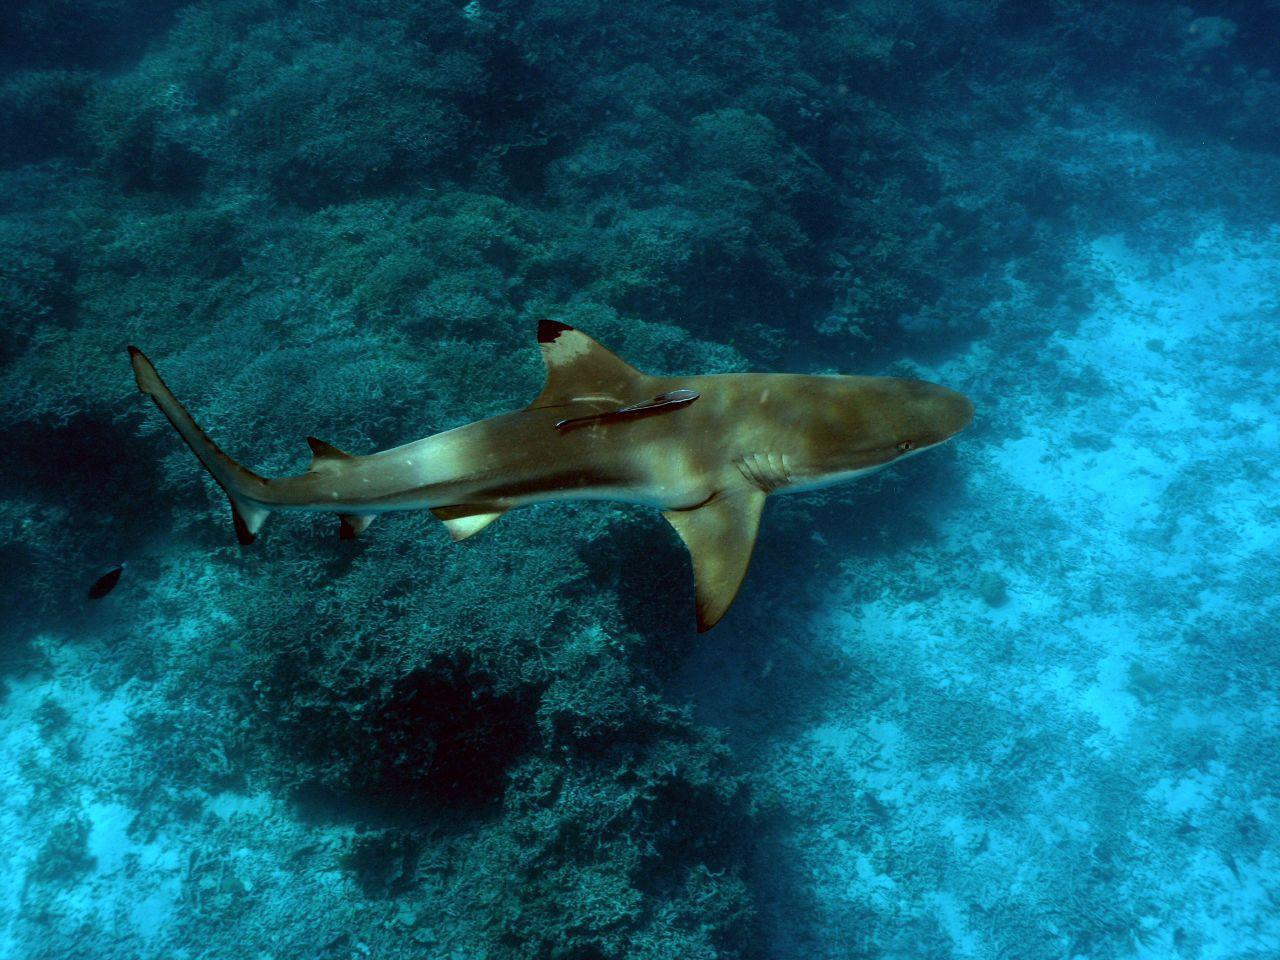 Baby Shark Stock Images RoyaltyFree Images amp Vectors